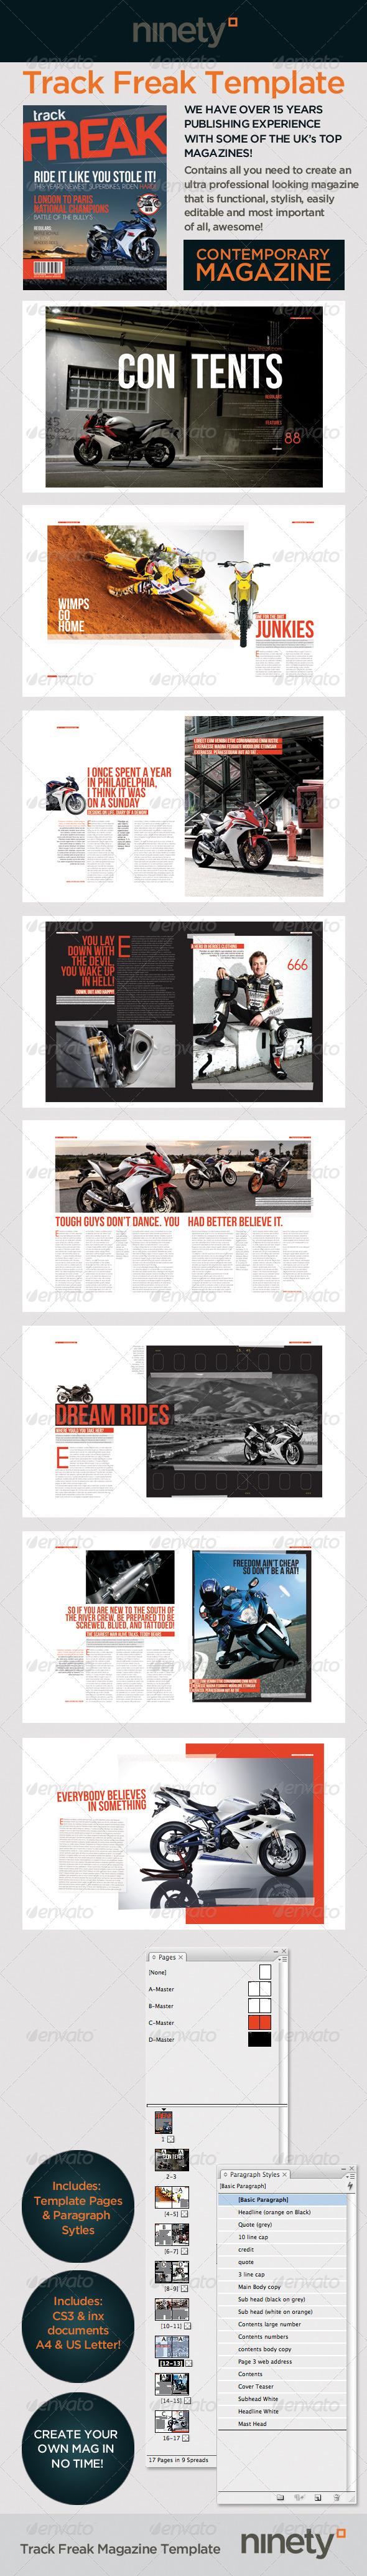 Track Freak Magazine Template - Magazines Print Templates